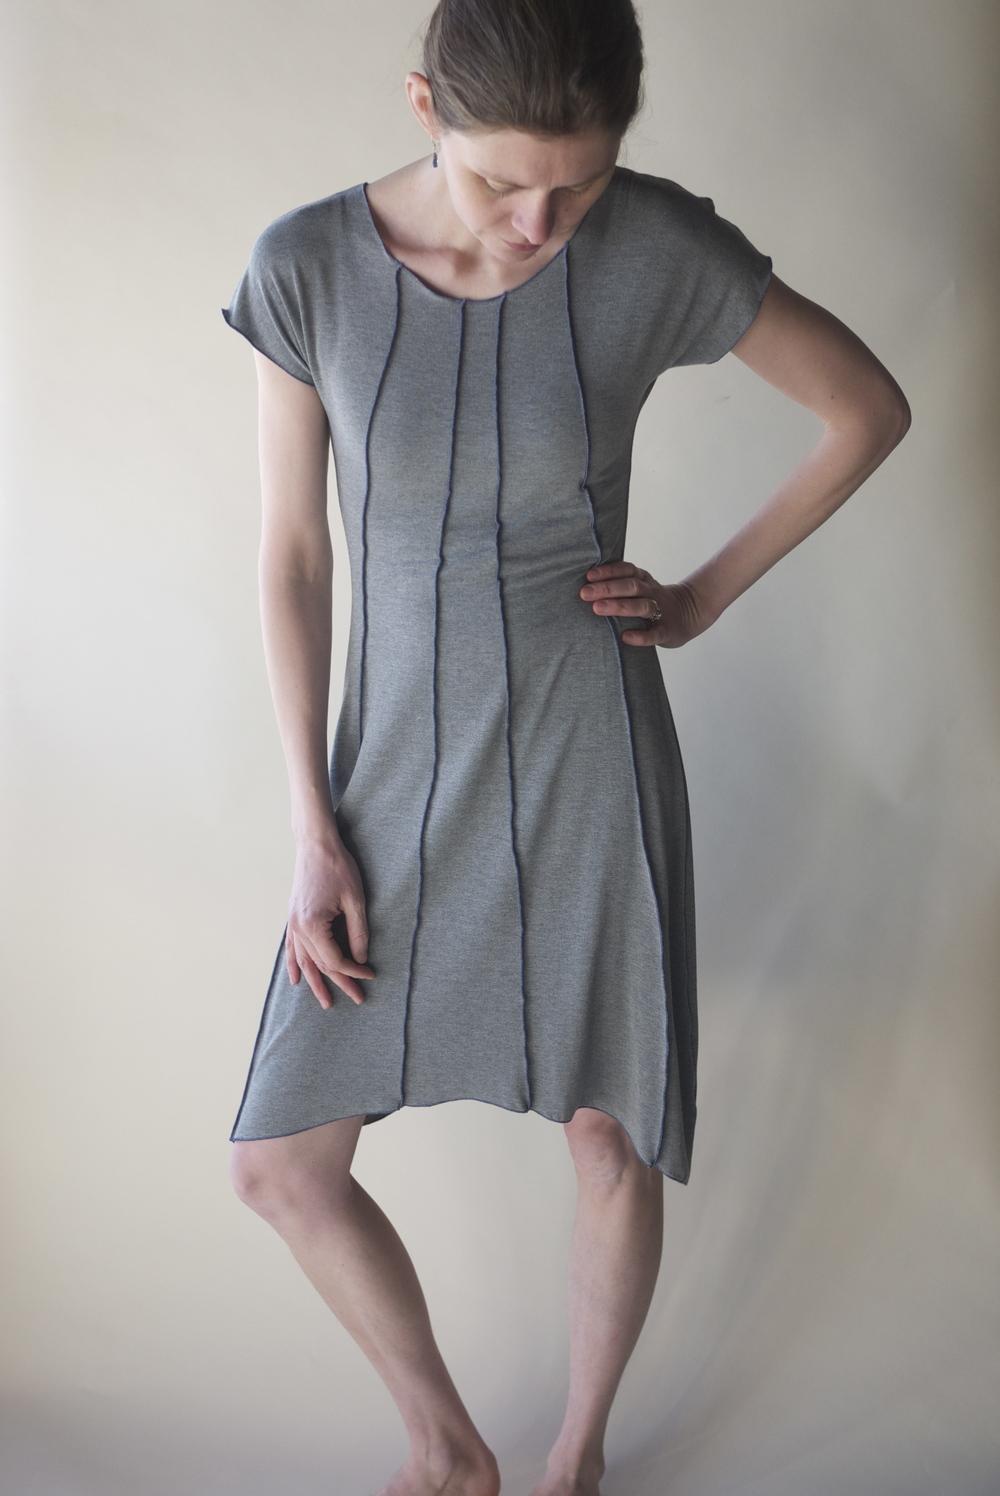 Maricopa Dress